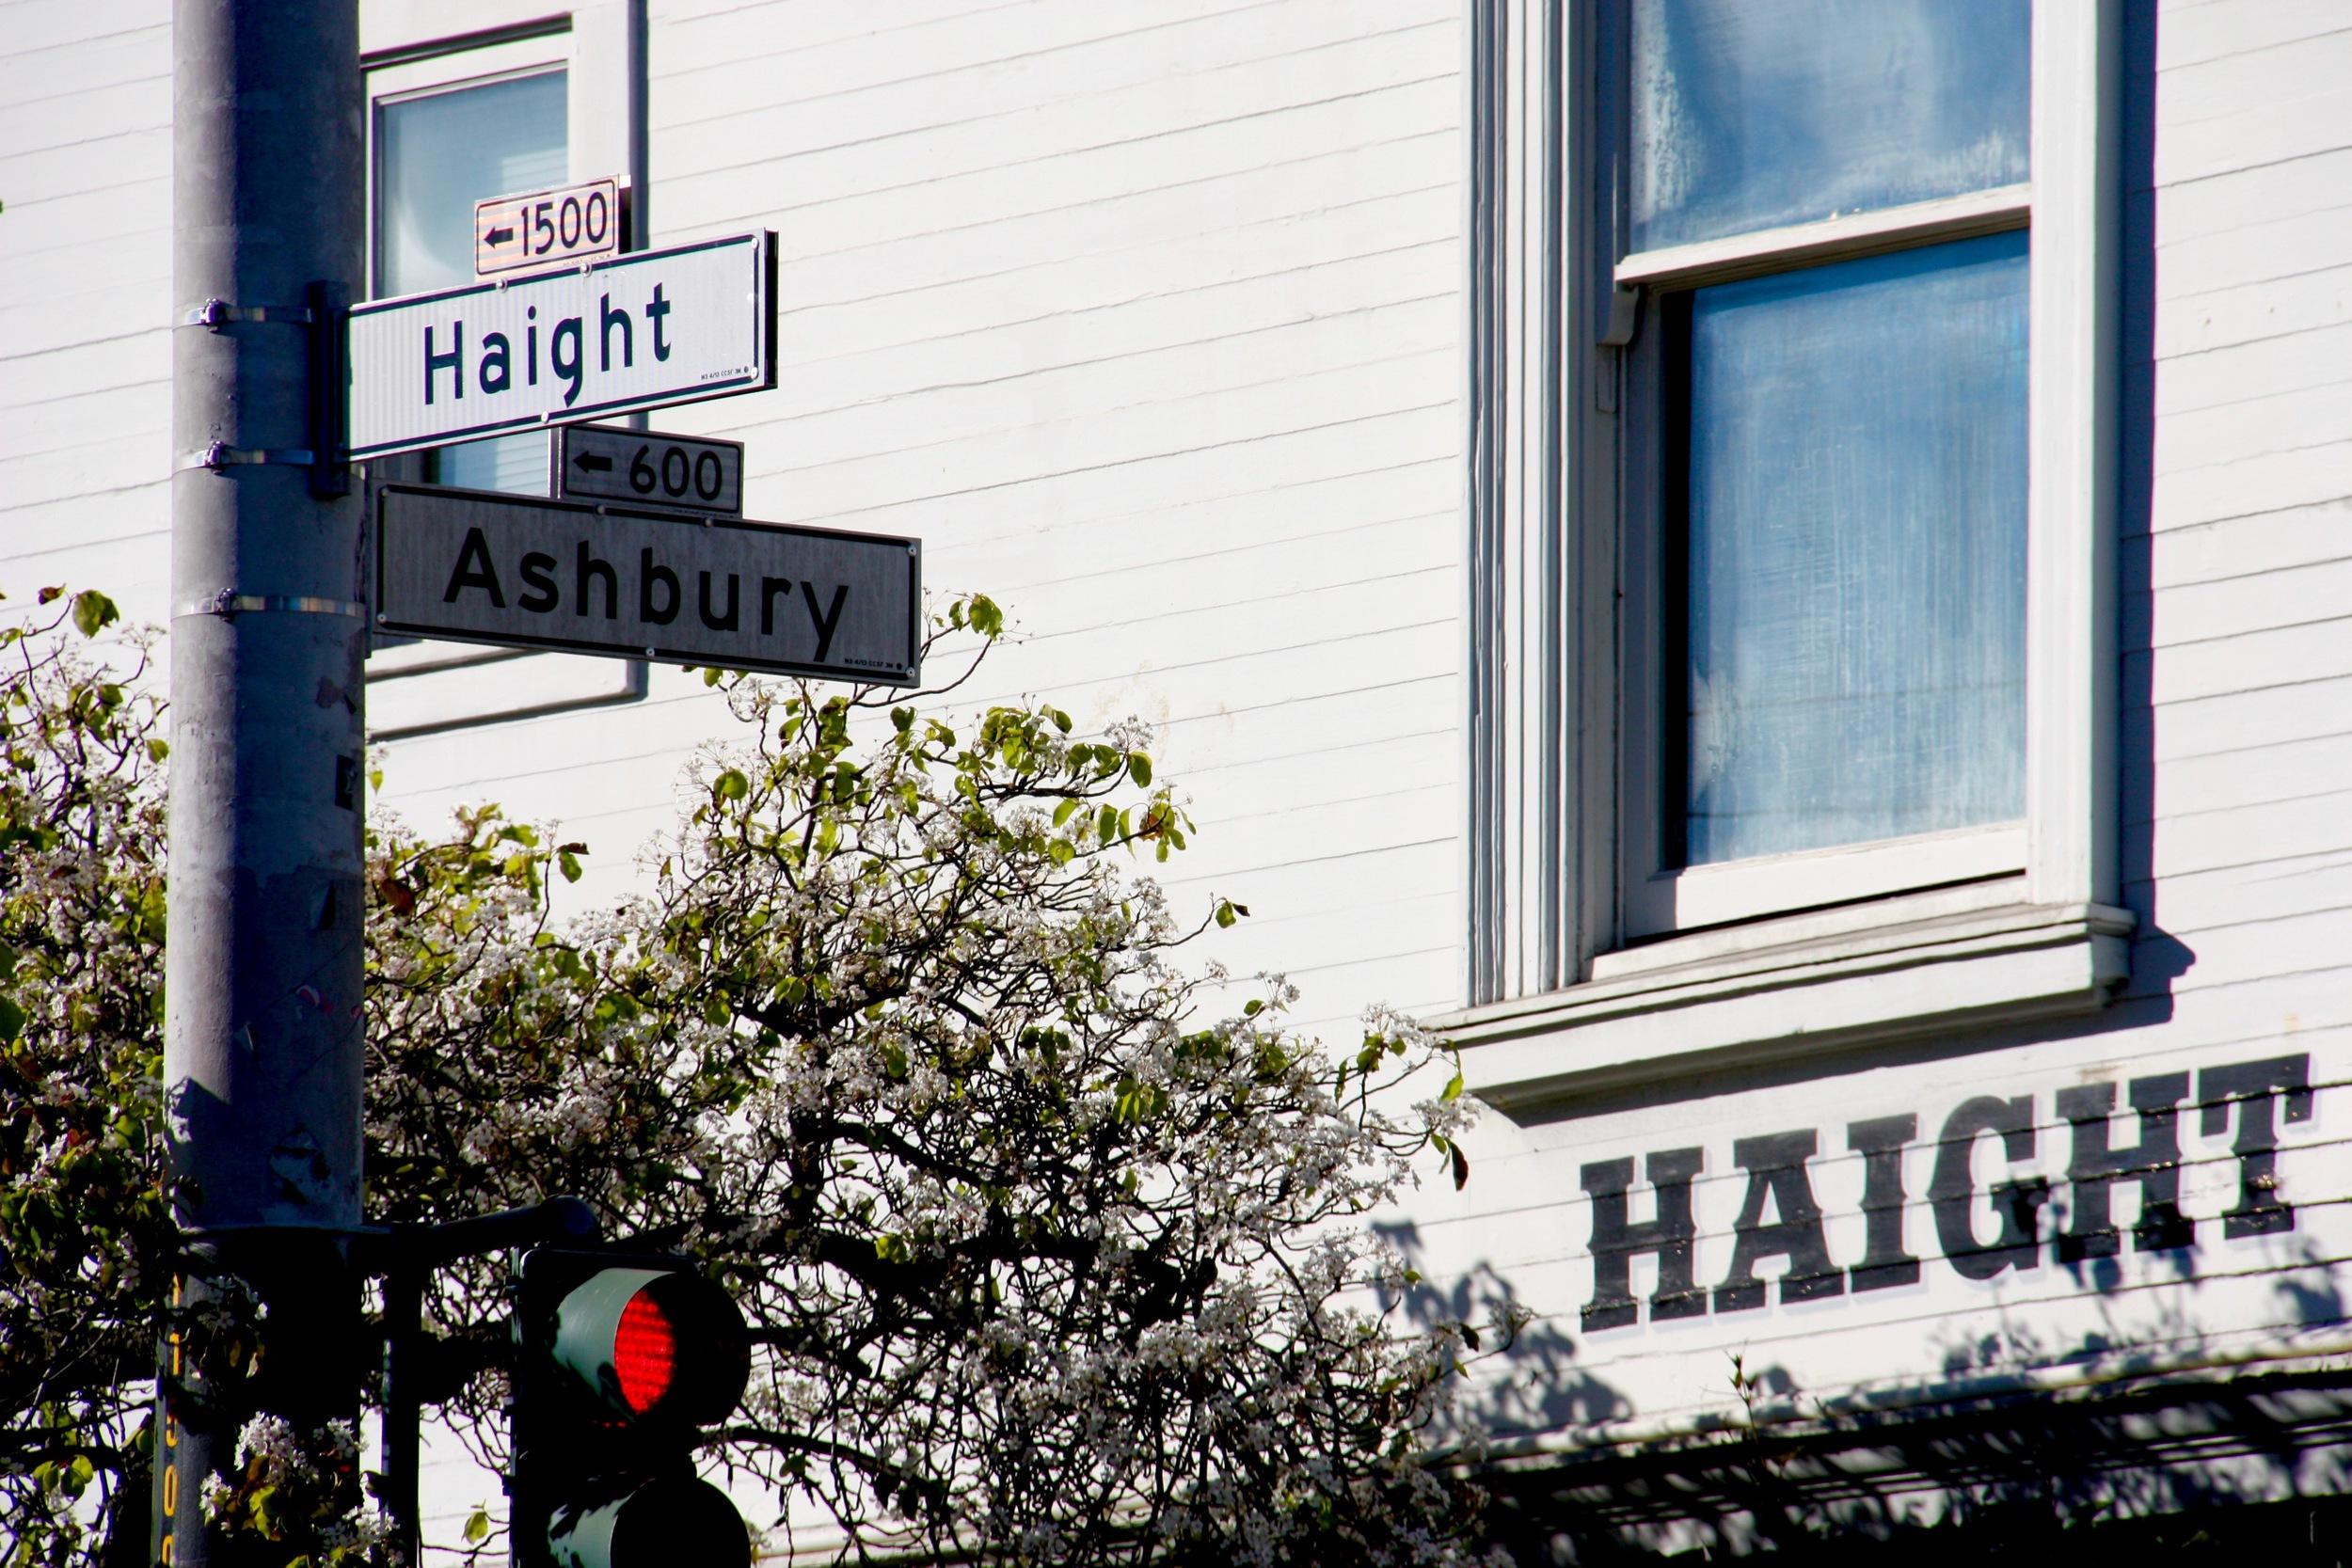 Haight & Ashbury corner, San Francisco California - 3 Days*